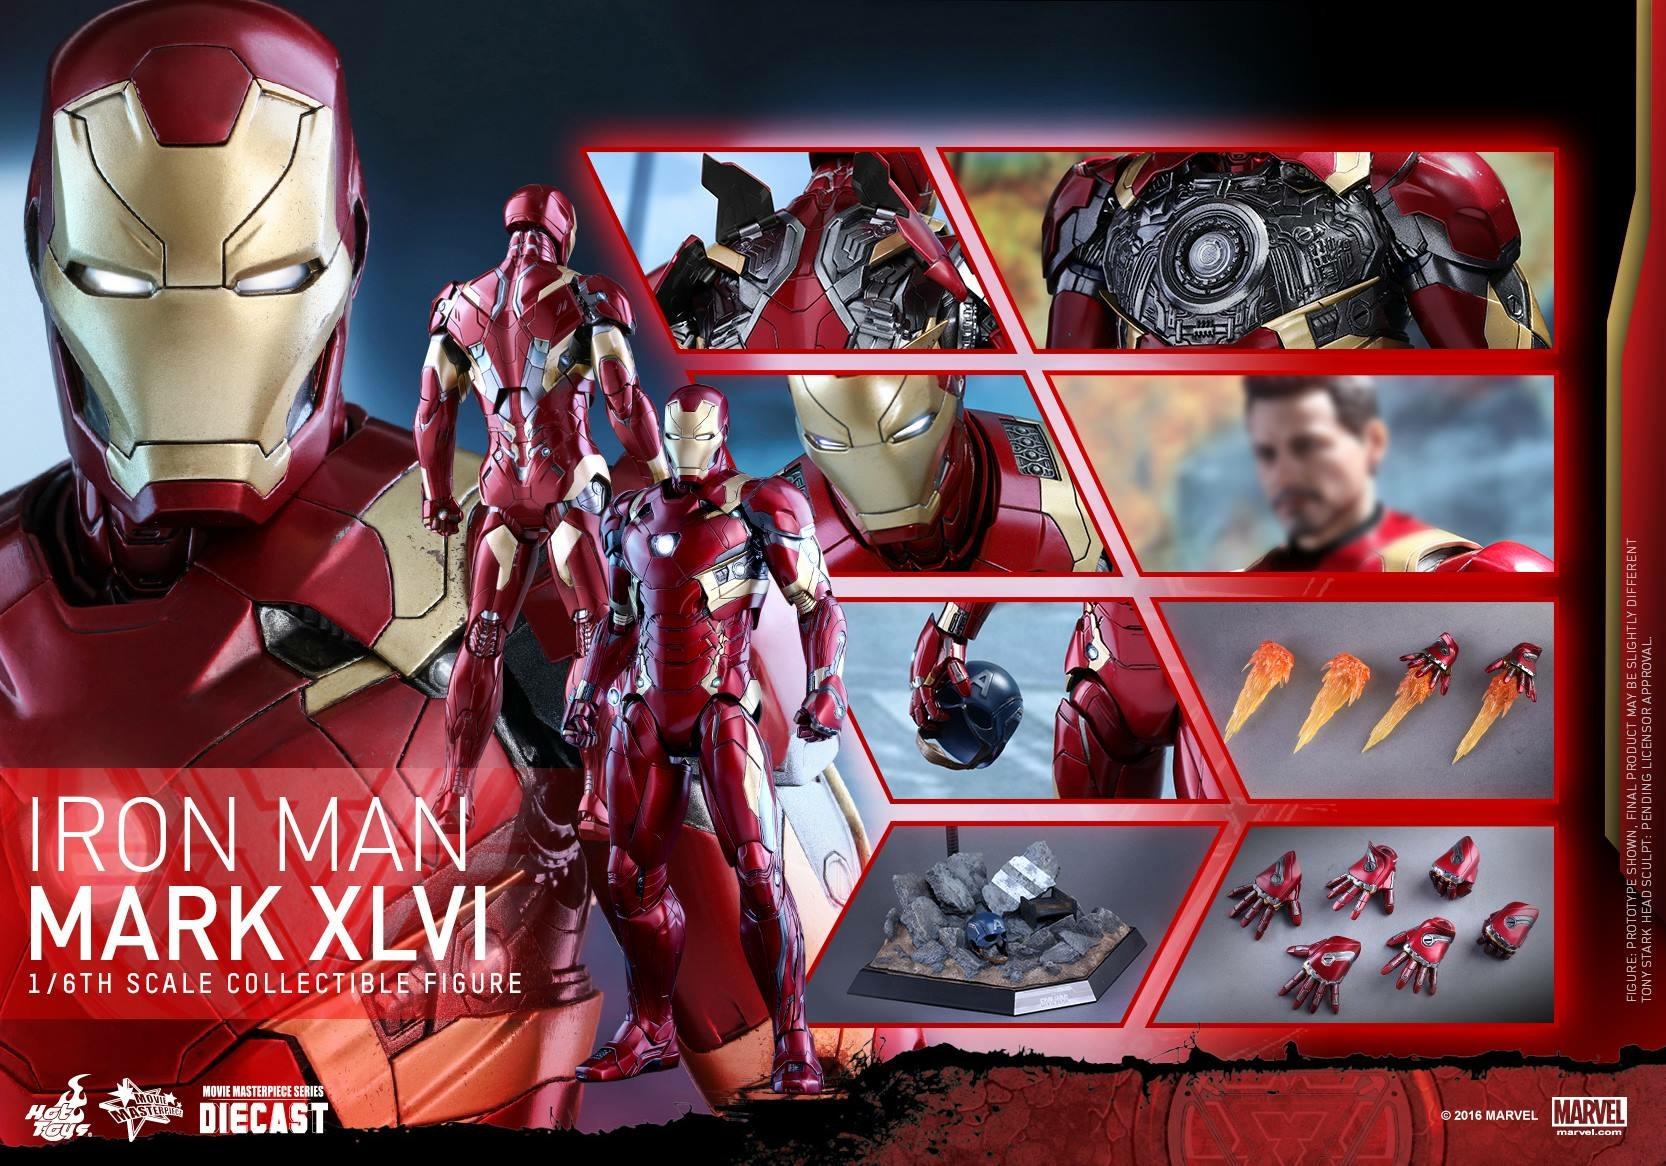 CAPTAIN AMERICA : CIVIL WAR - IRON MAN MARK XLVI (MMS353DC16) 160419024100564699